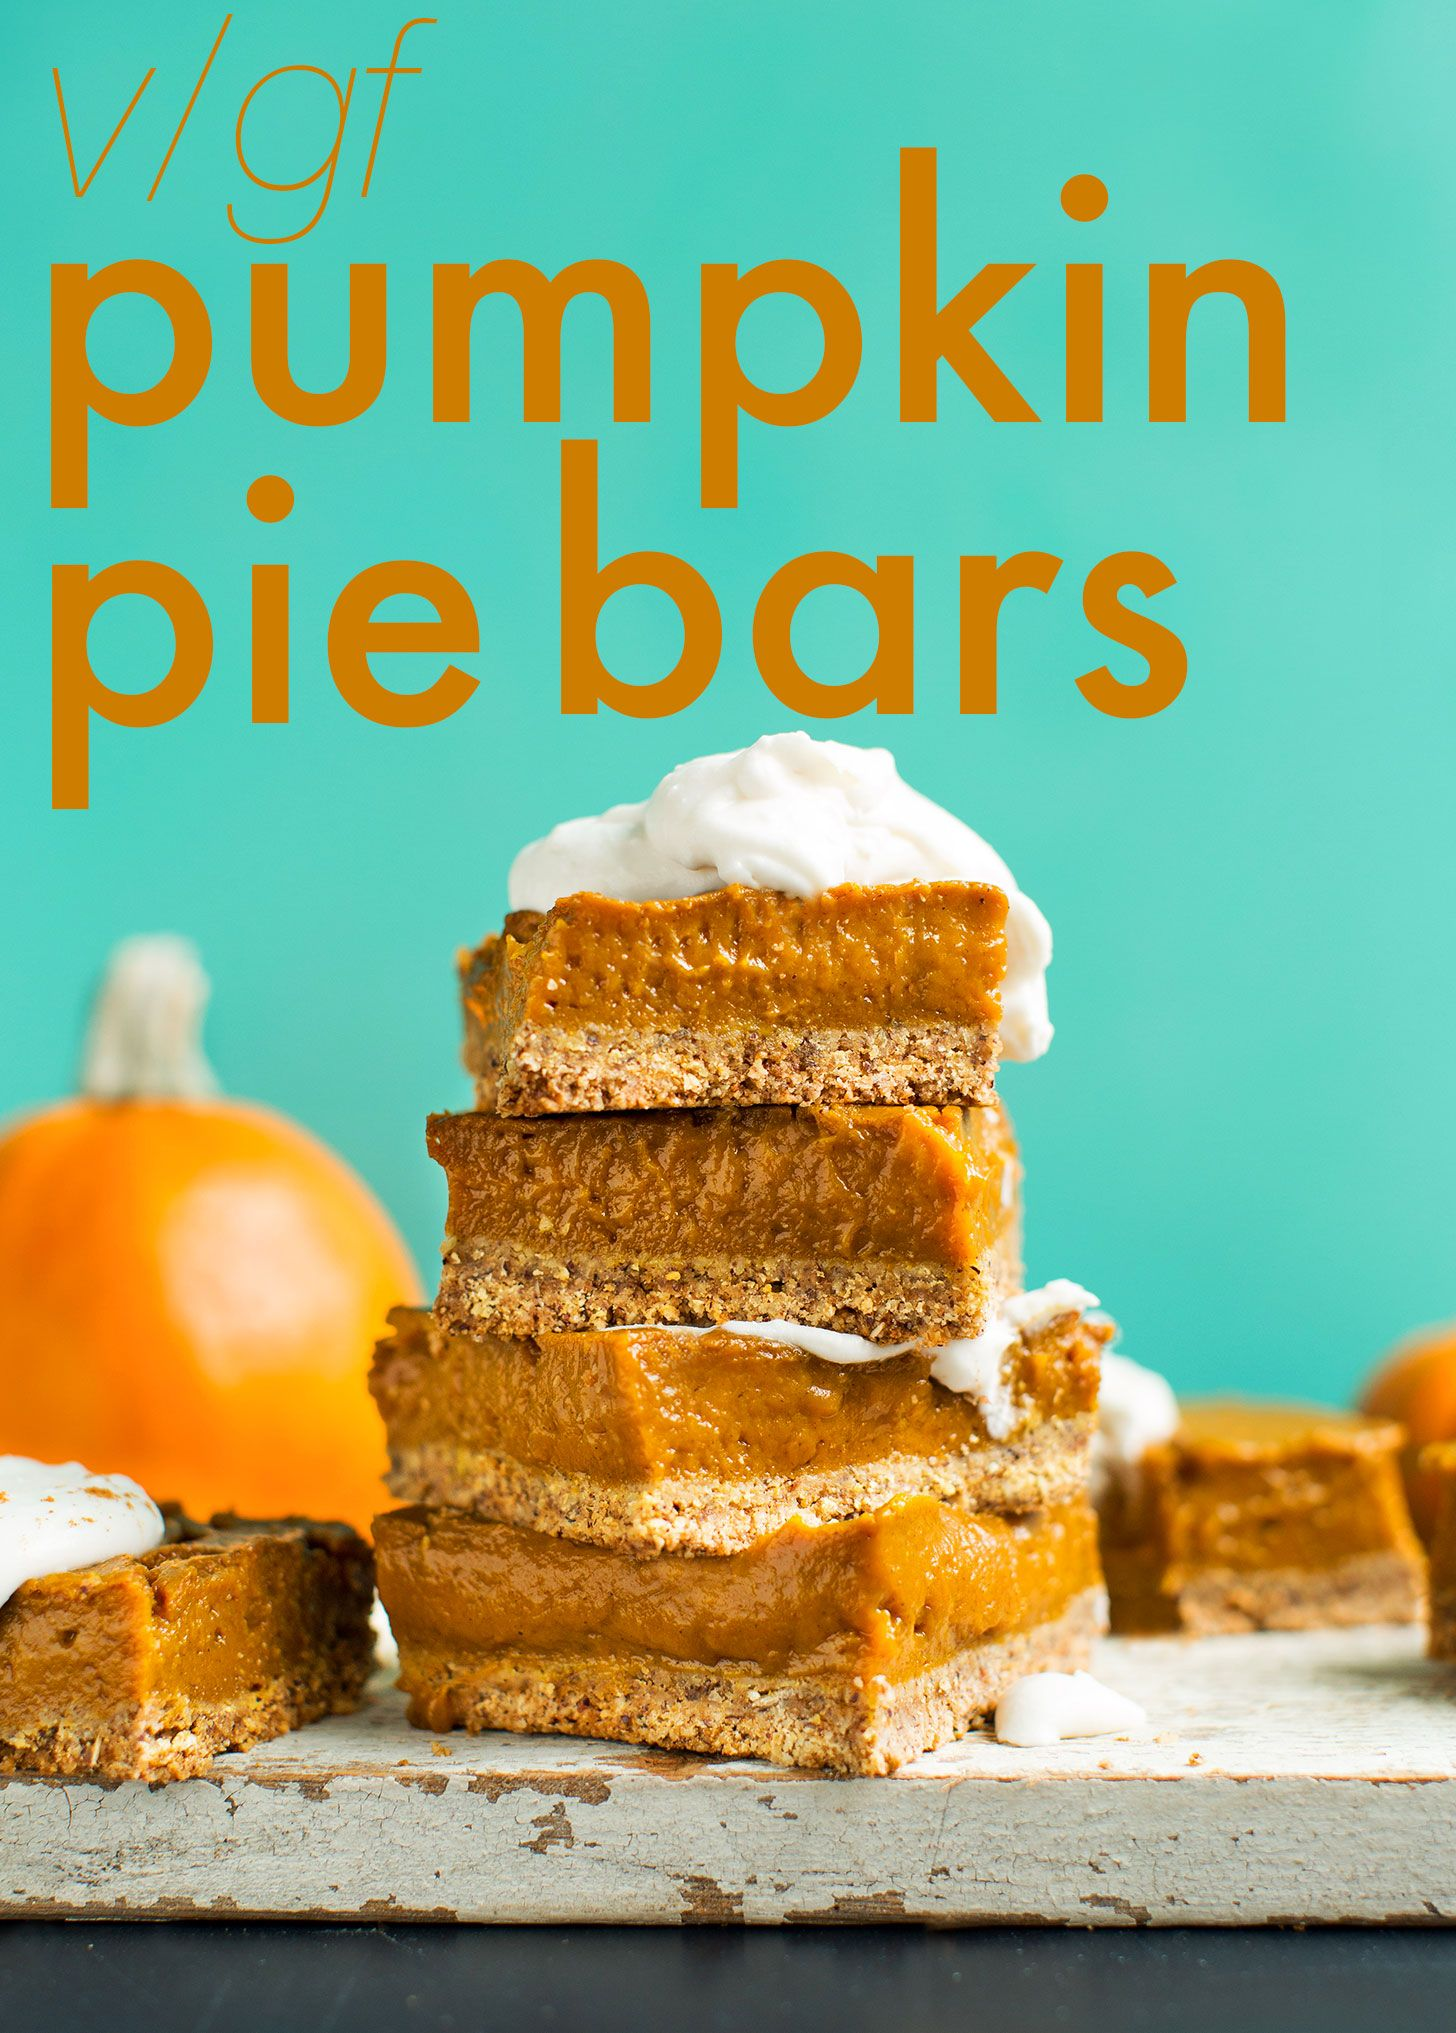 Creamy Pumpkin Pie Bars V Gf